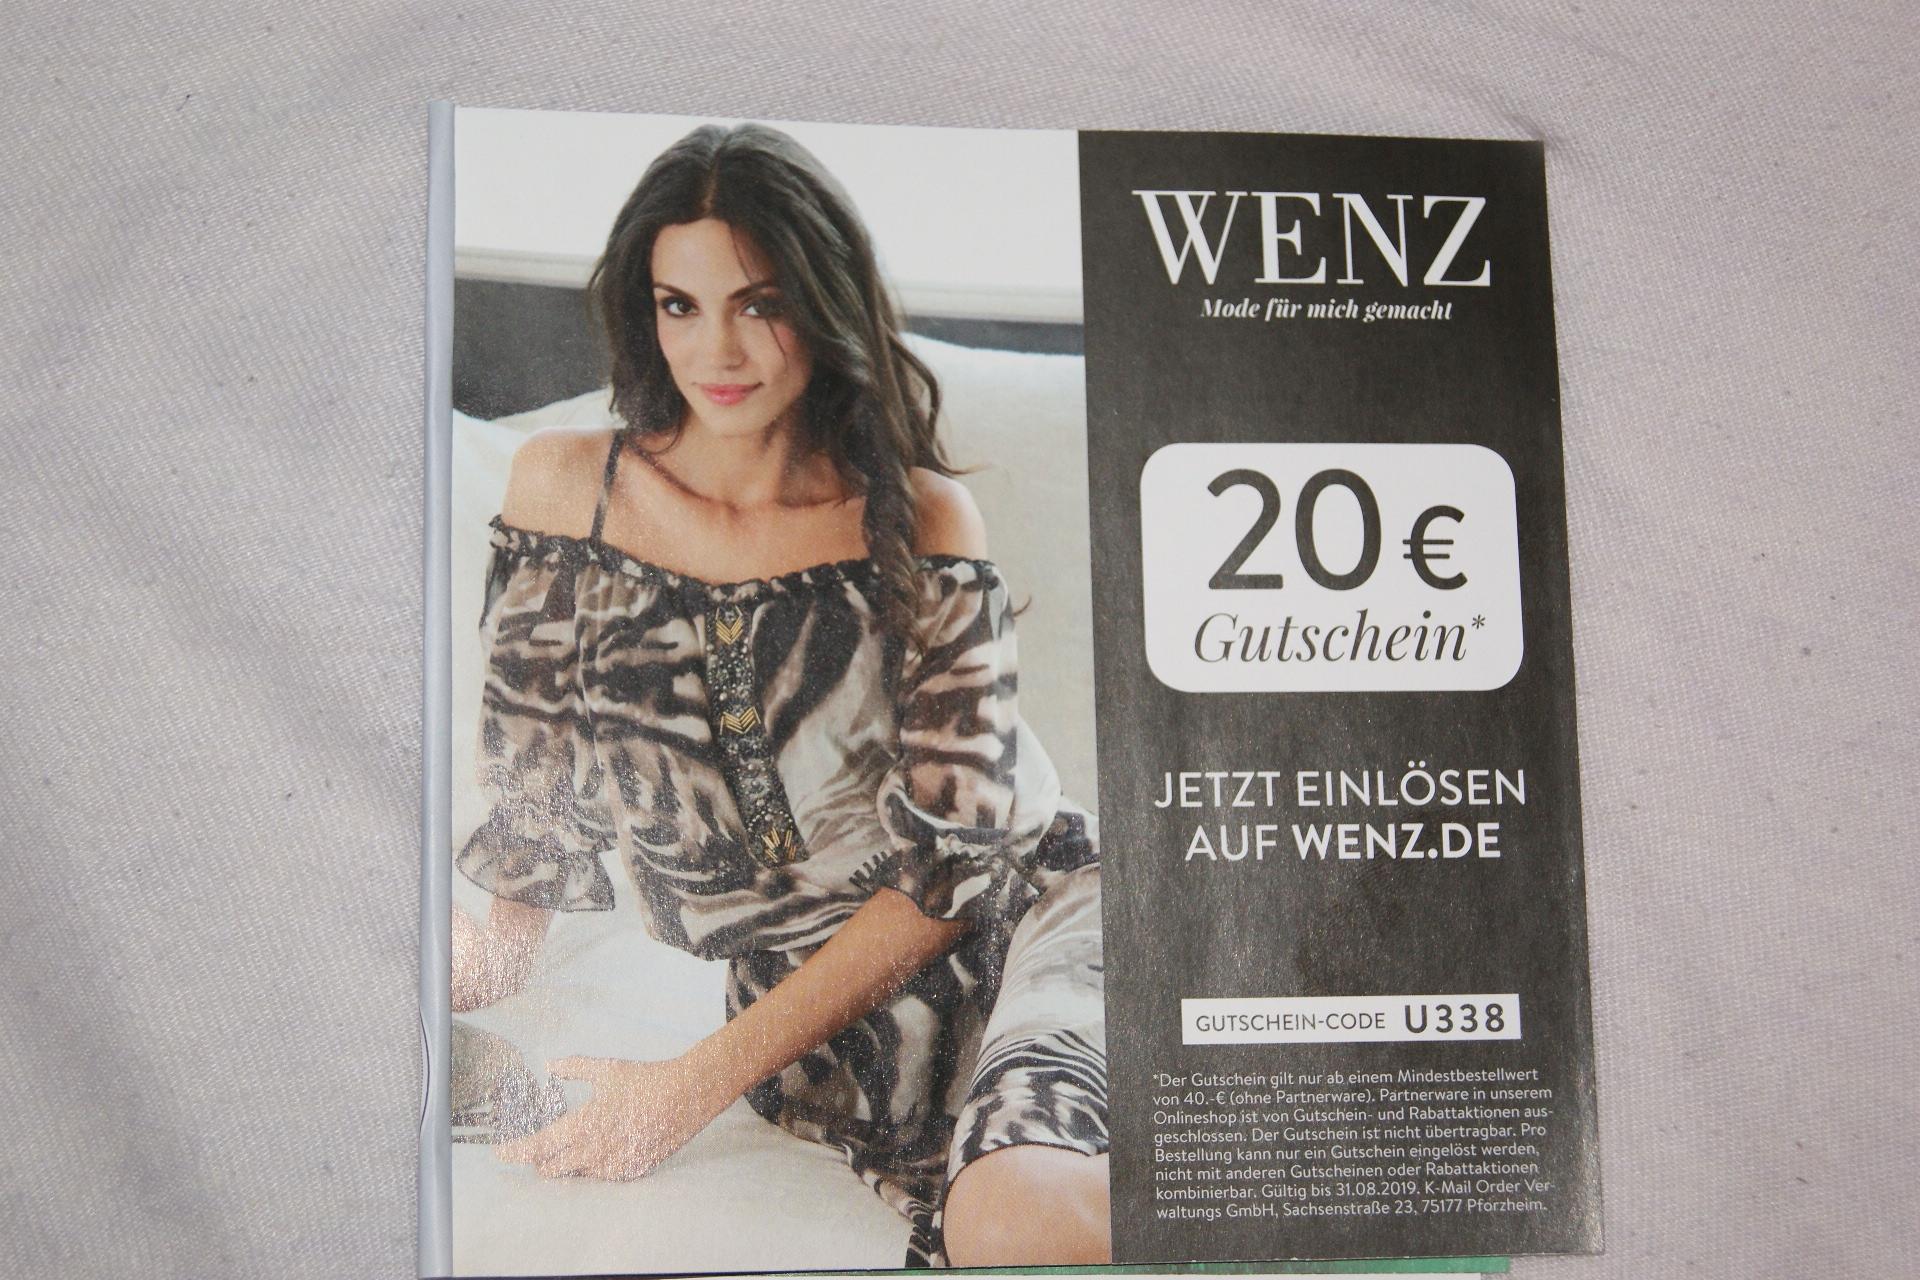 20 Euro Rabatt ab 40 Euro Warenbestellungen bei Wenz.de